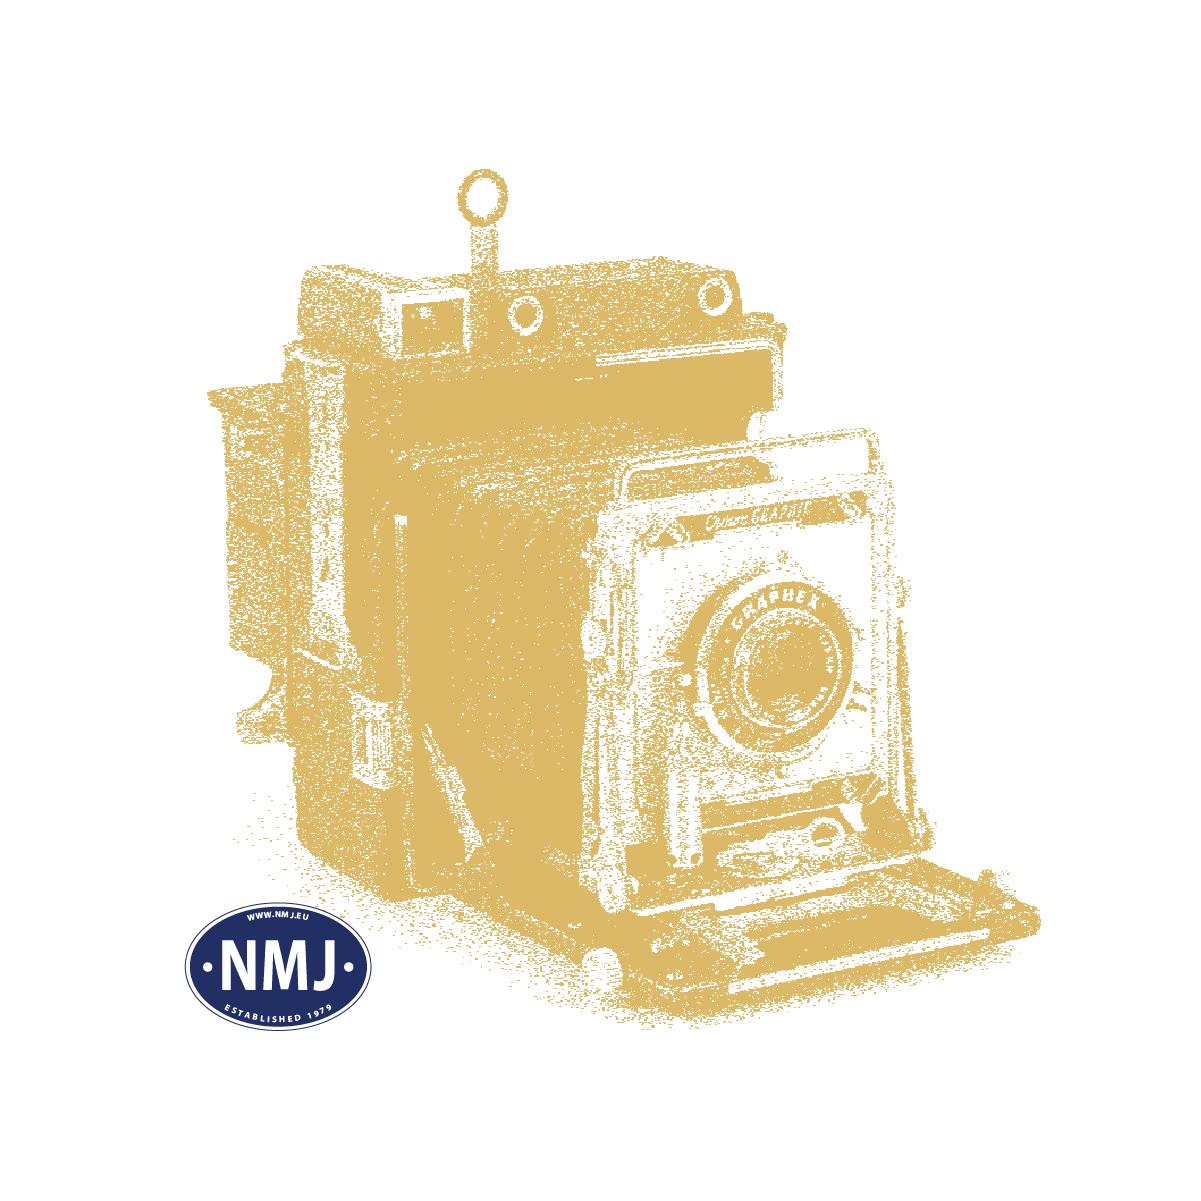 NMJT95402 - NMJ Topline SNCB 202003, AC m/Lyd (NMJT96402)